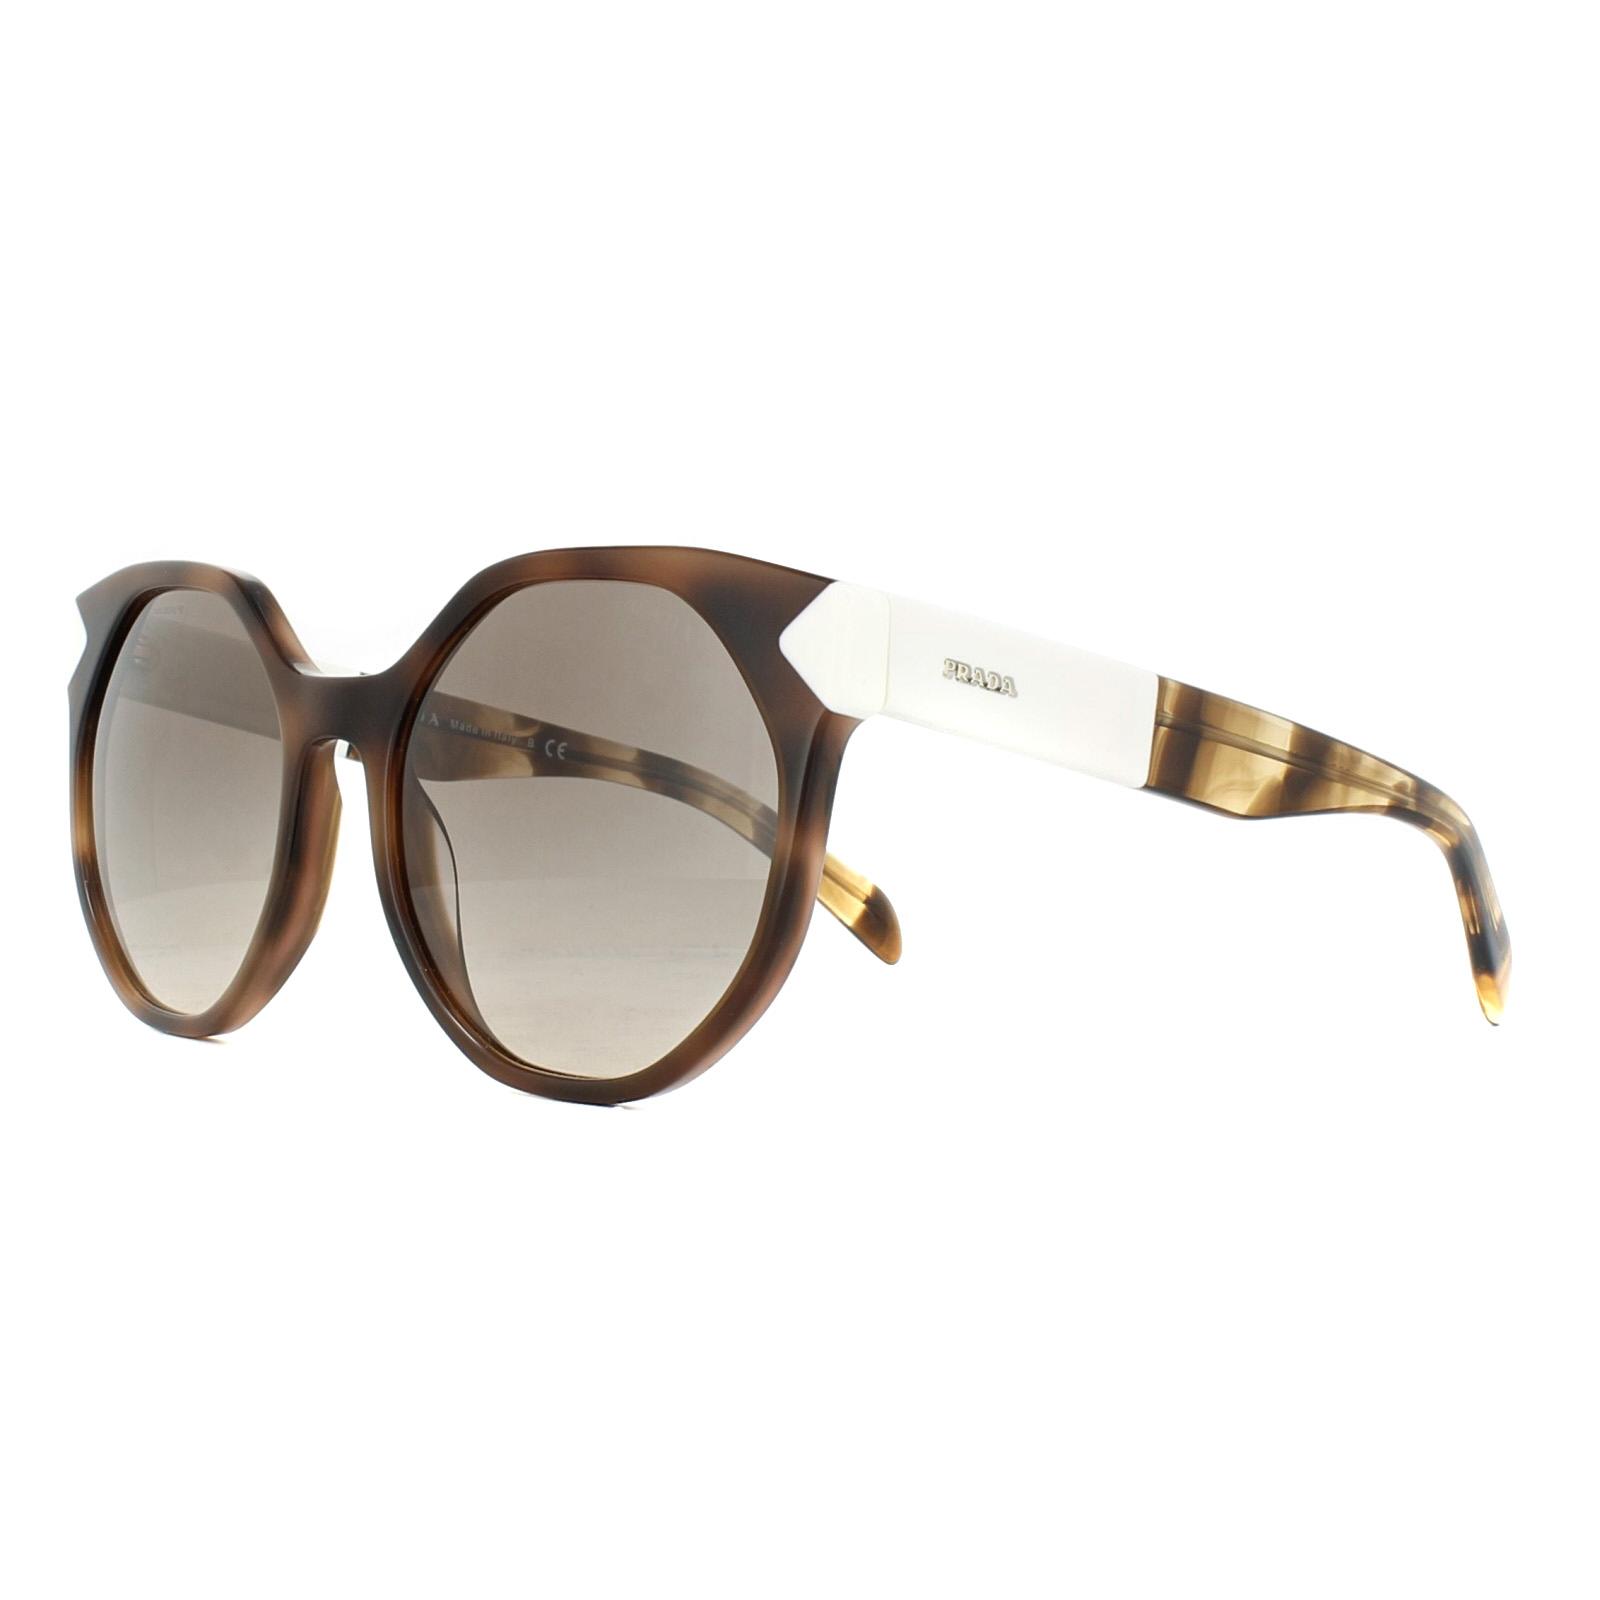 541f24fc2701 Details about Prada Sunglasses PR11TS USG3D0 Striped Dark Brown Light Brown  Gradient Grey